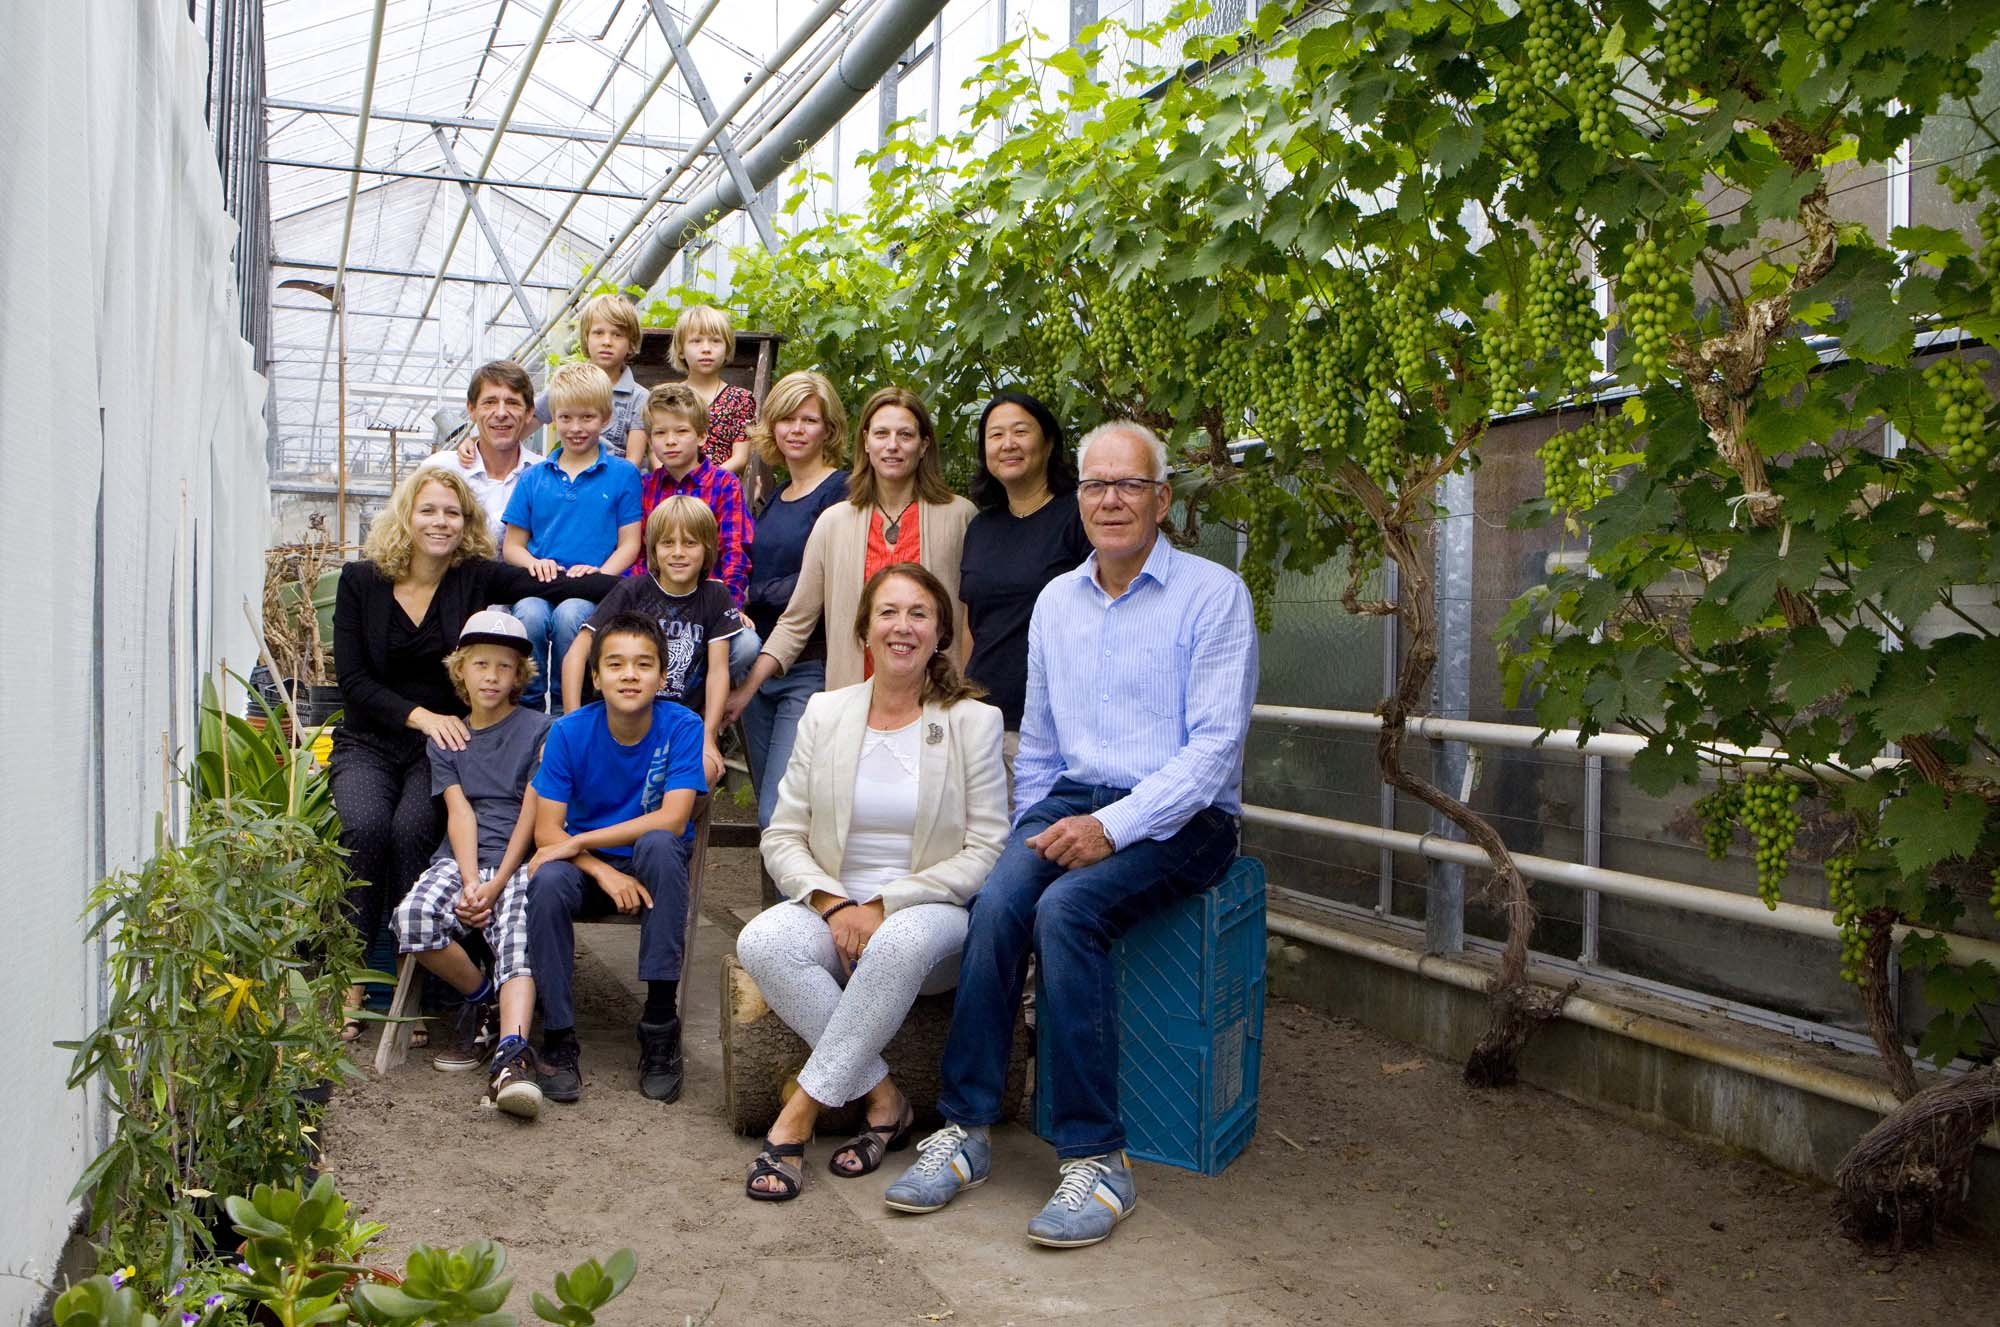 Foto gezinsportret familieportret binnen in kas druivenkweker Monster Westland